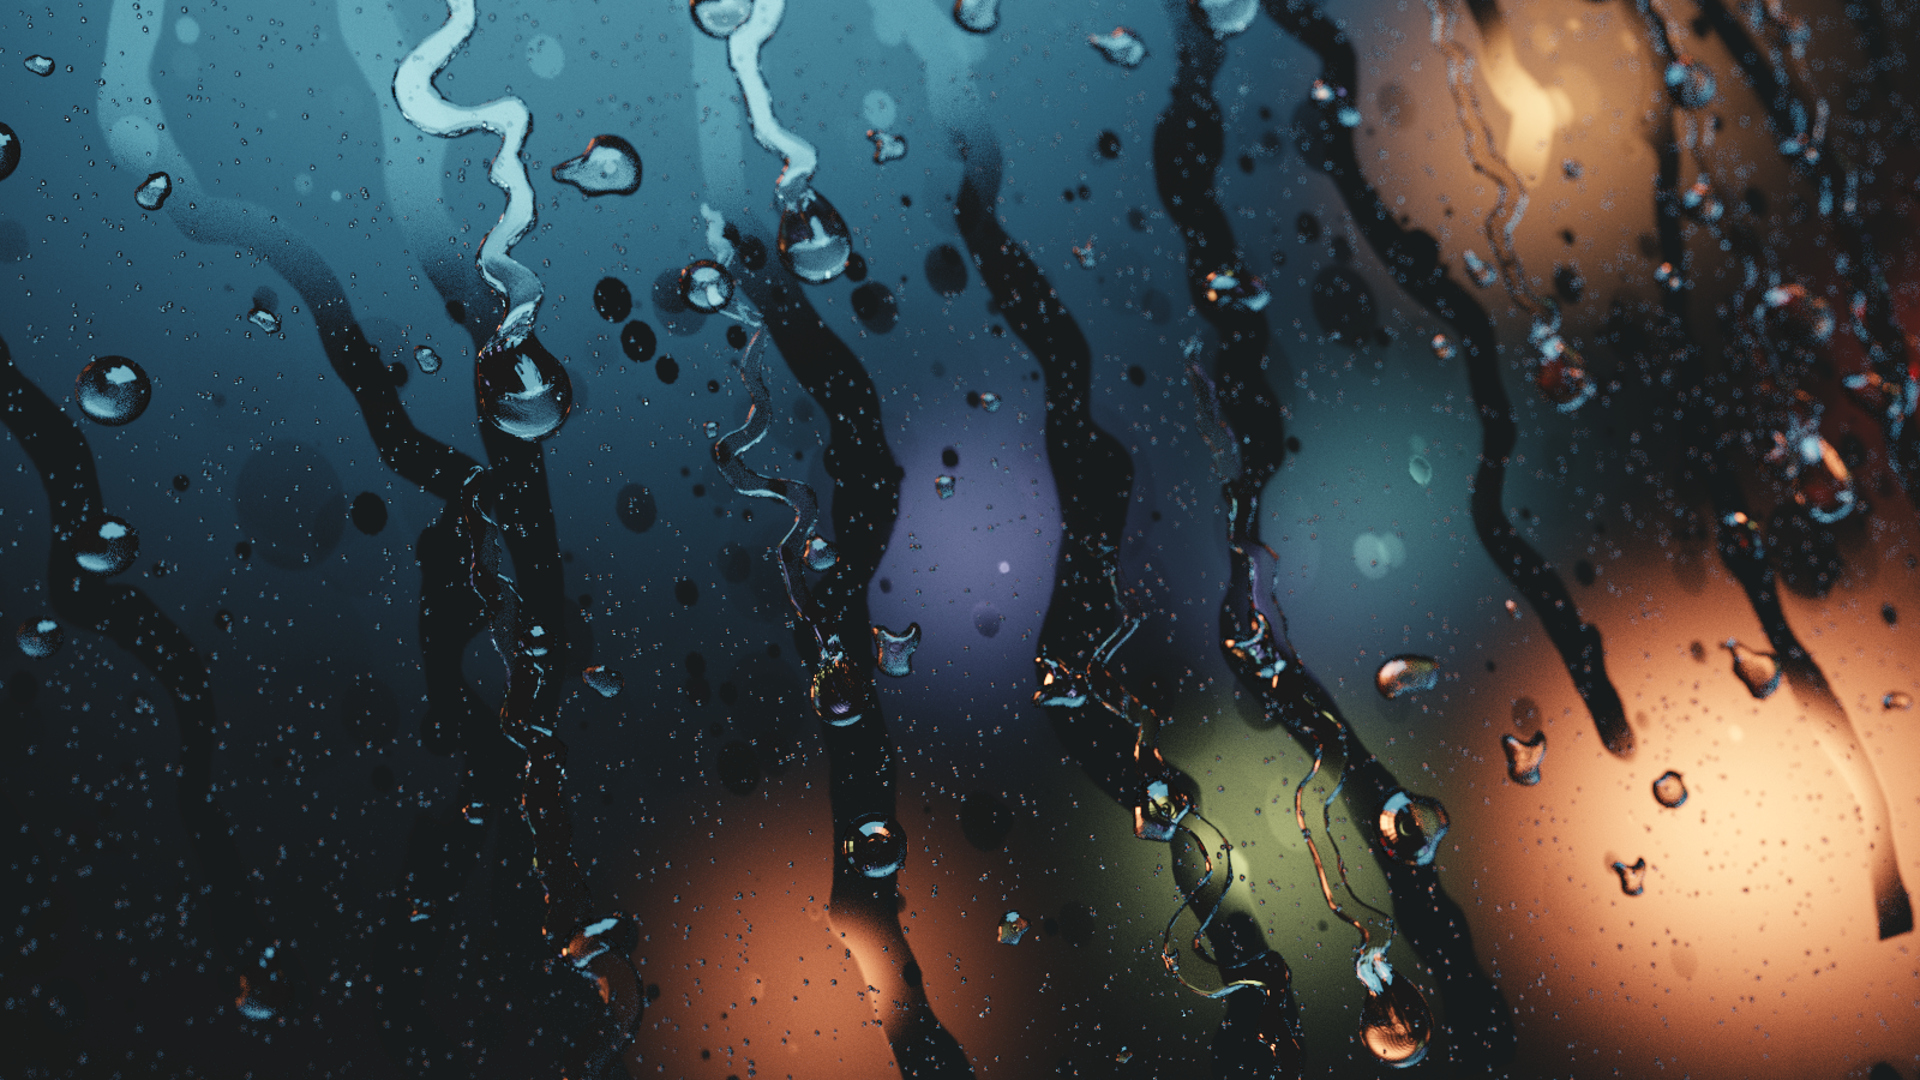 макро,стекло,вода,свет  № 1192779 бесплатно